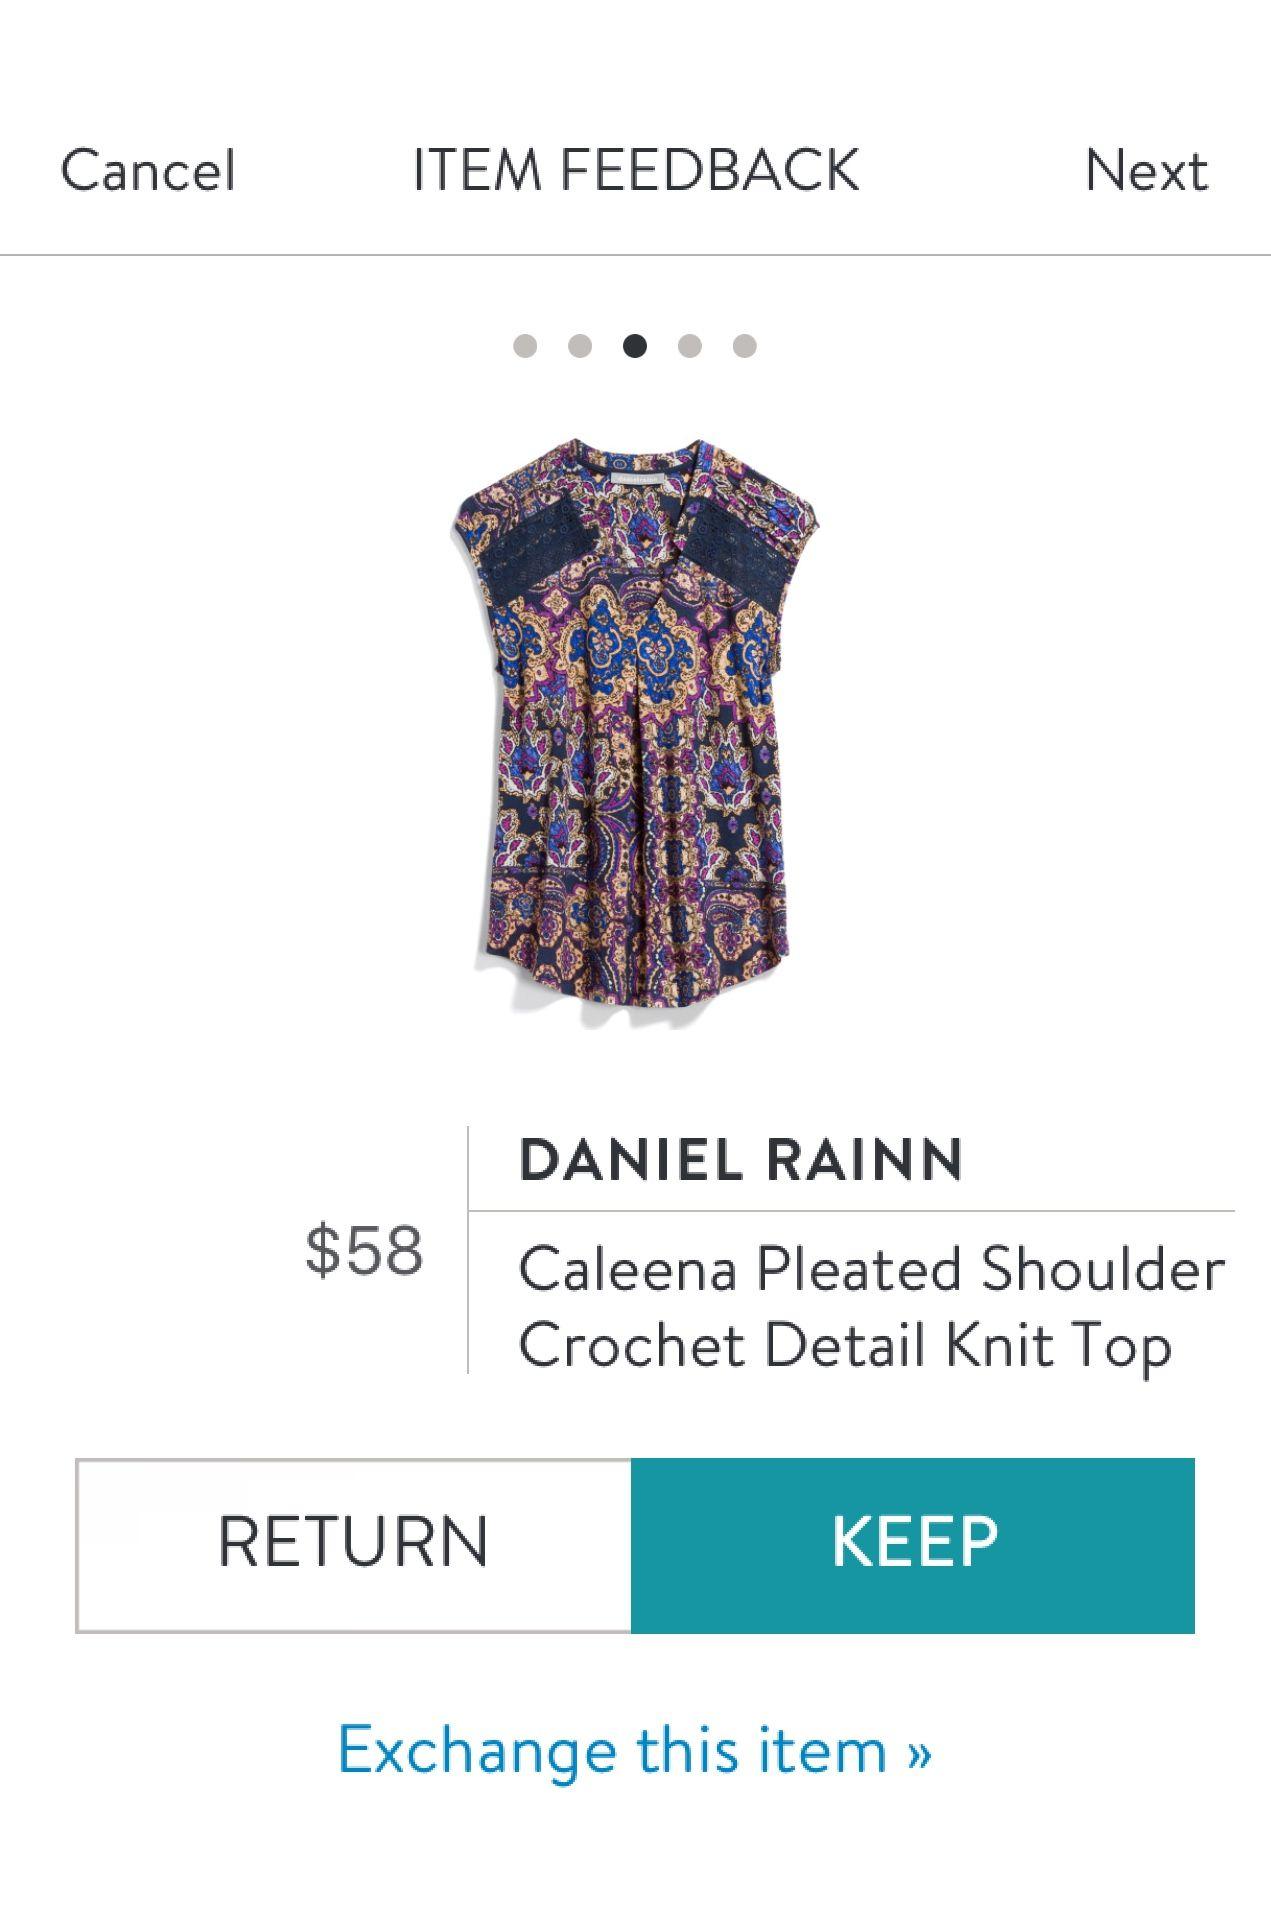 Daniel Rainn Caleena Pleated Shoulder Crochet Detail Knit